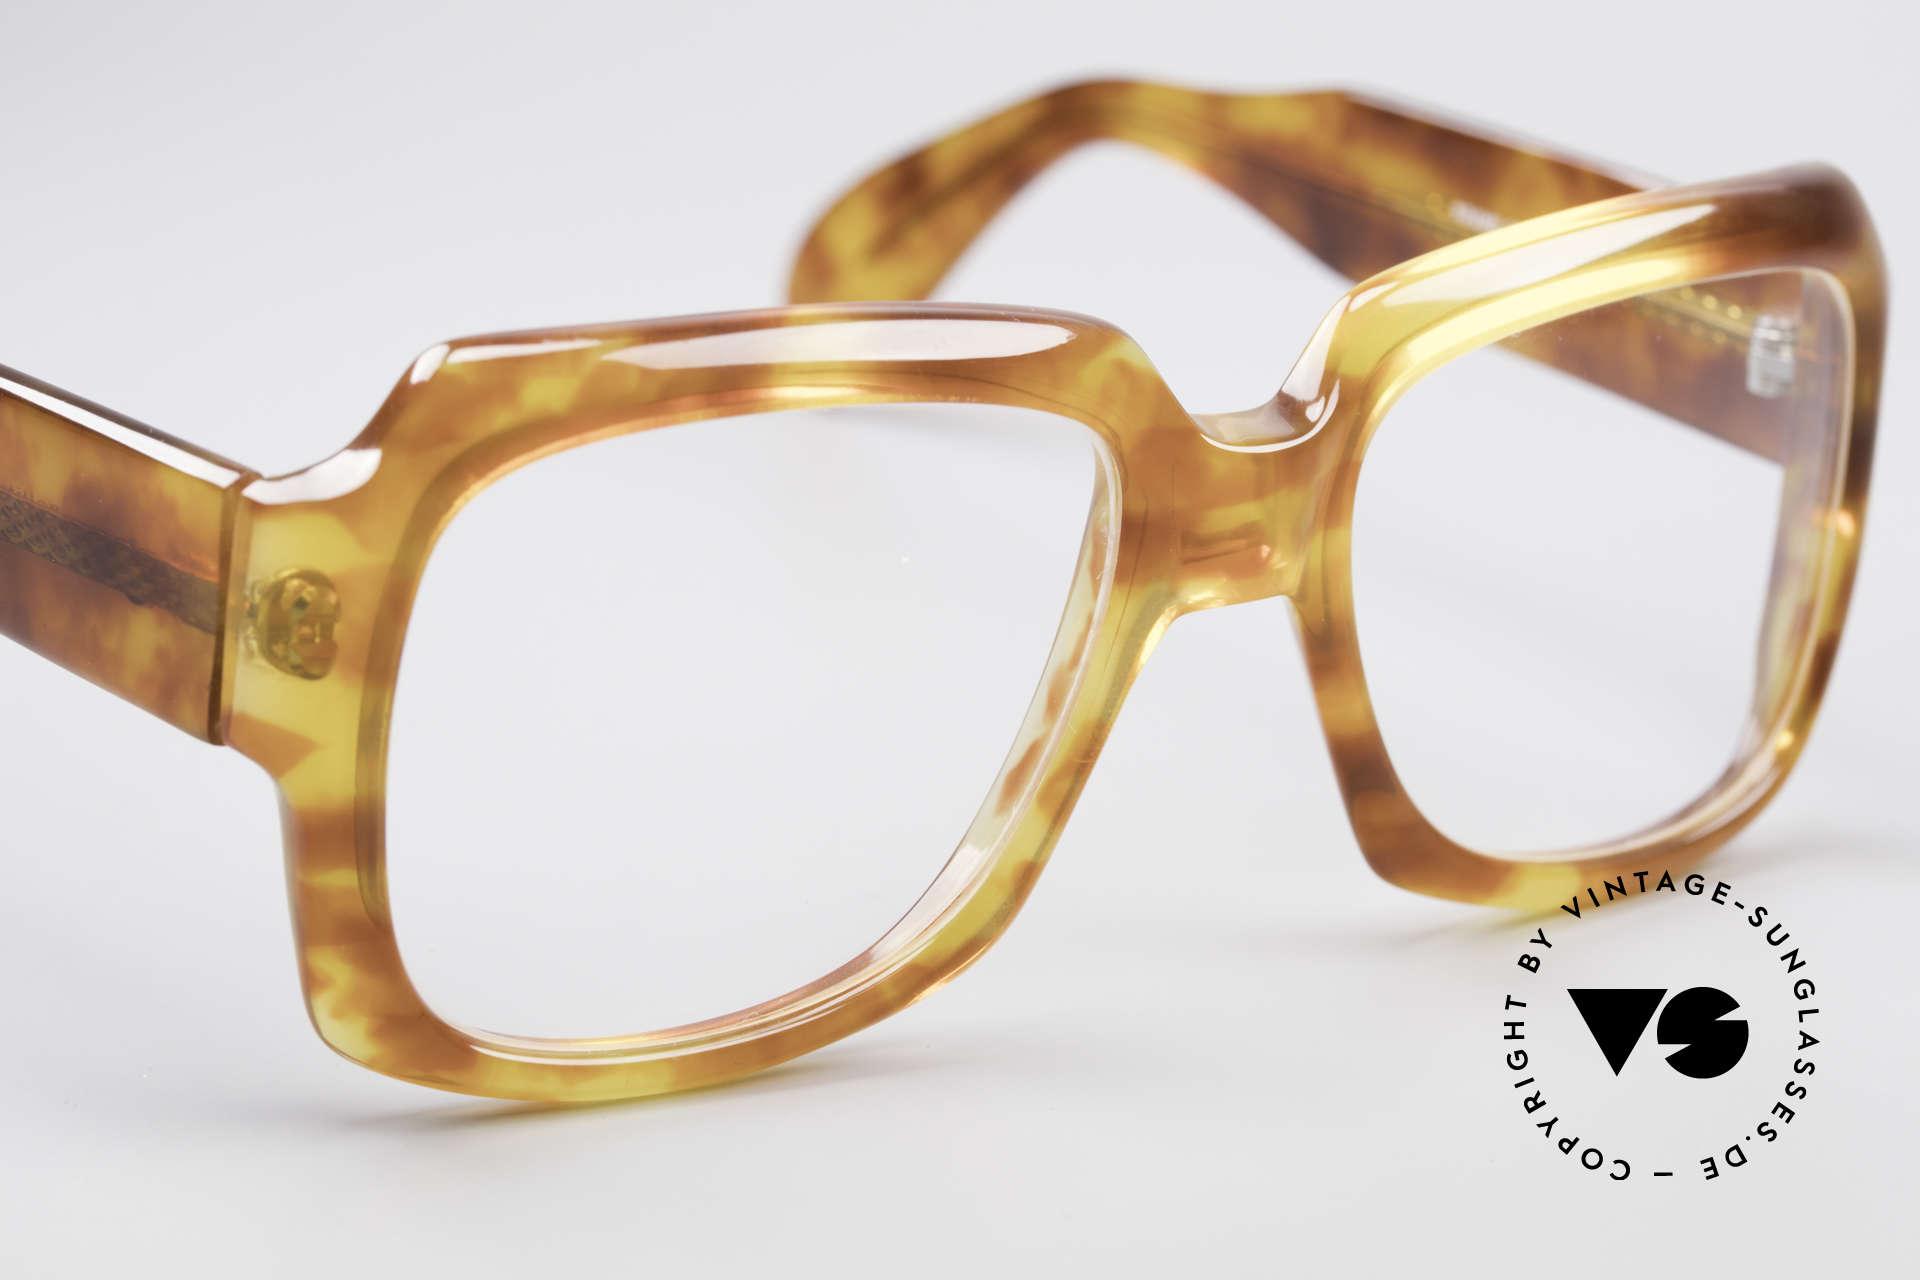 Zollitsch 249 70's Old School Eyeglasses, noble, timeless frame pattern: 130 width = S / M size, Made for Men